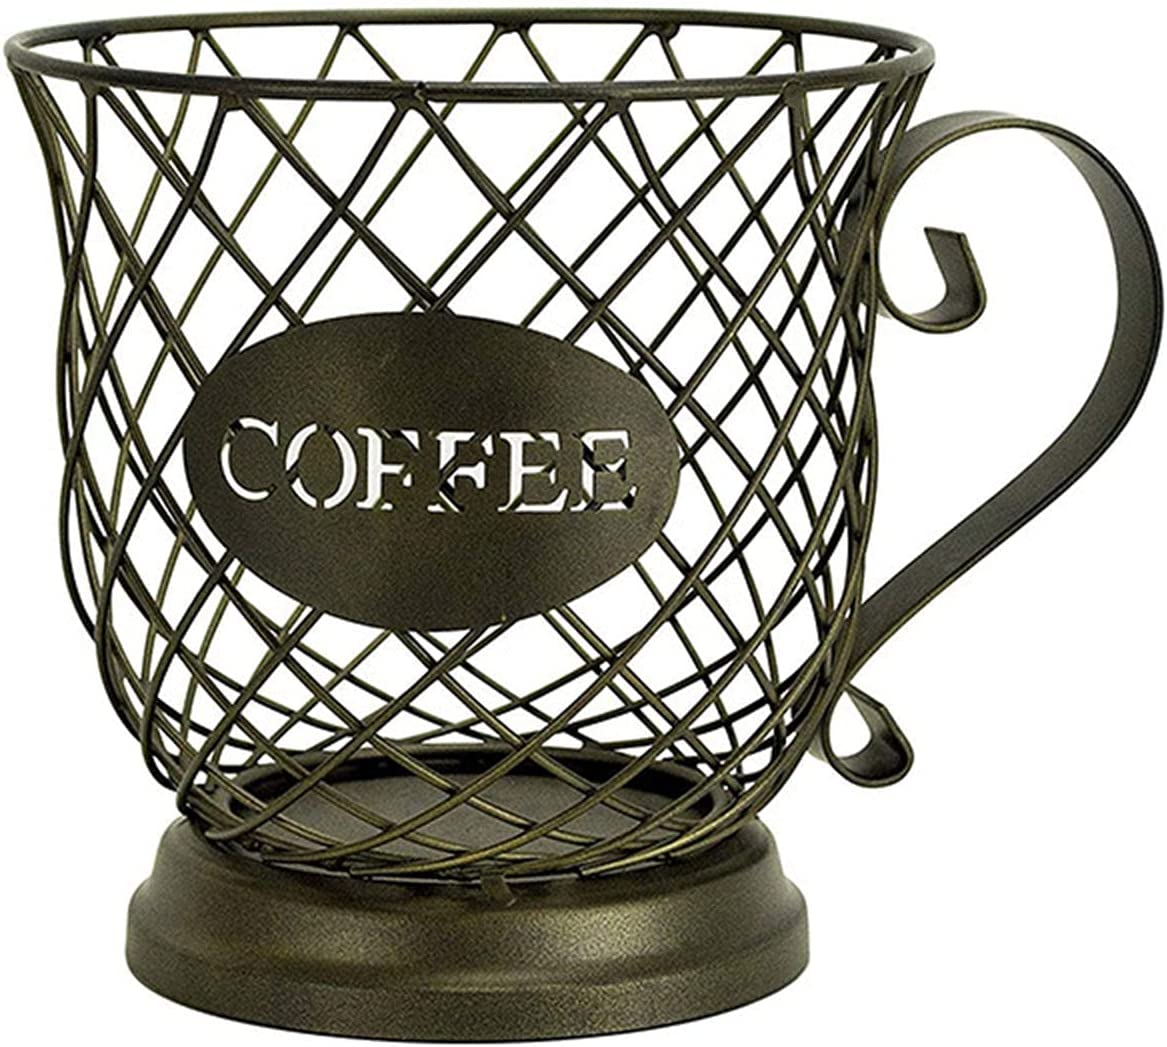 Portland Mall WKAUKGJH K Cup Holder Black Holders Shape New arrival Coffee Pod Mug